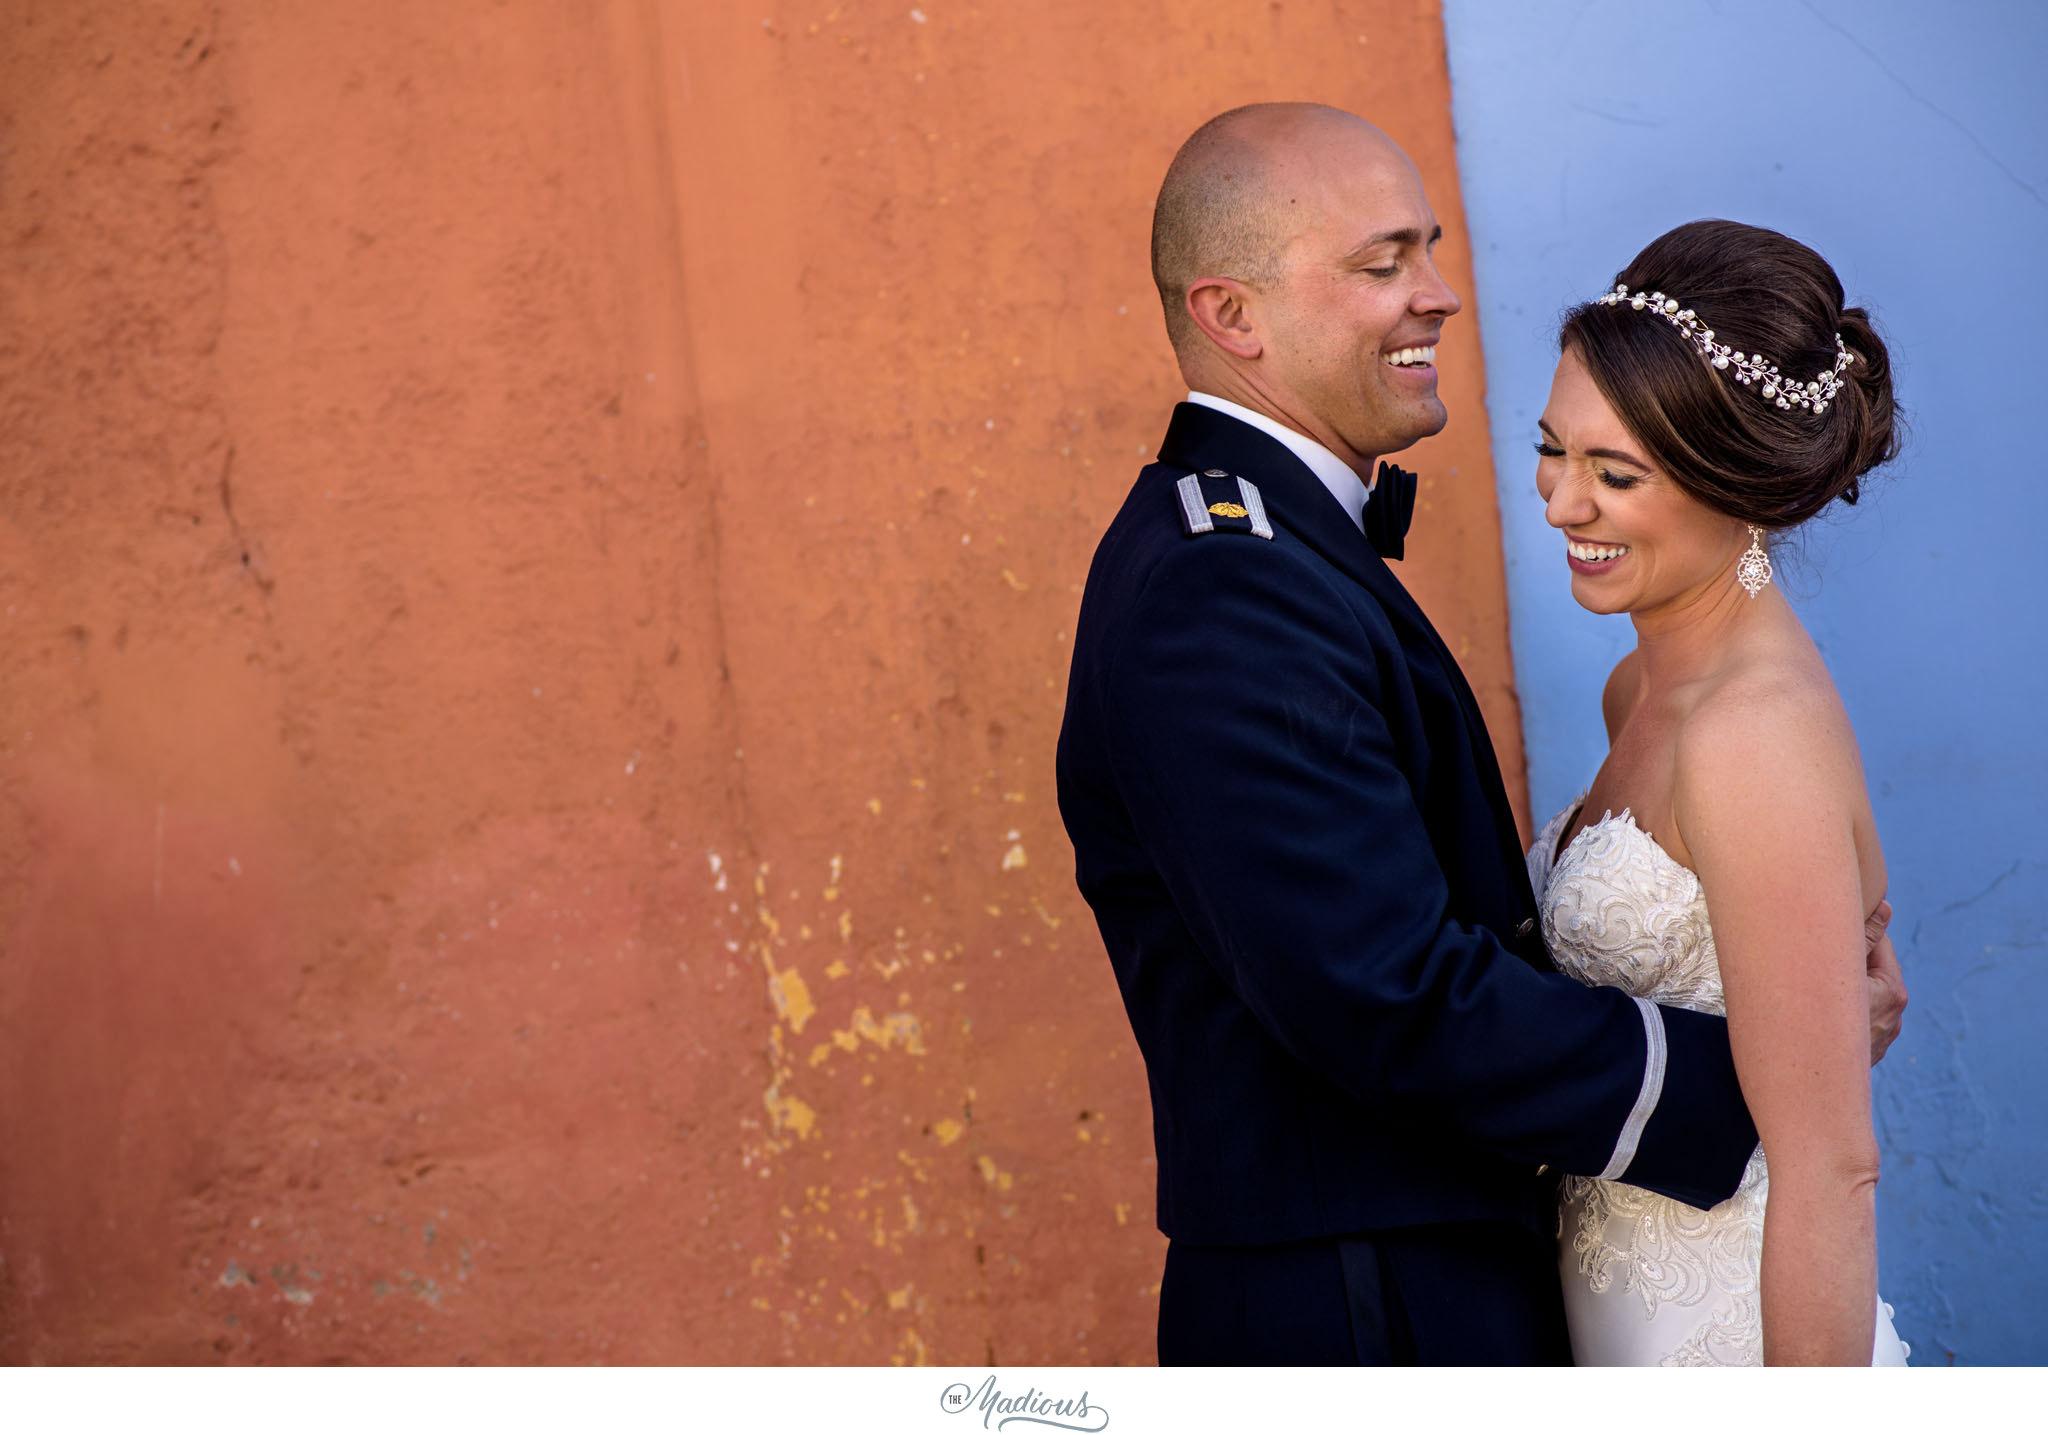 Leigh_Rob_Antigua_Guatemala_Santa_Clara_Destination_Wedding_34.JPG